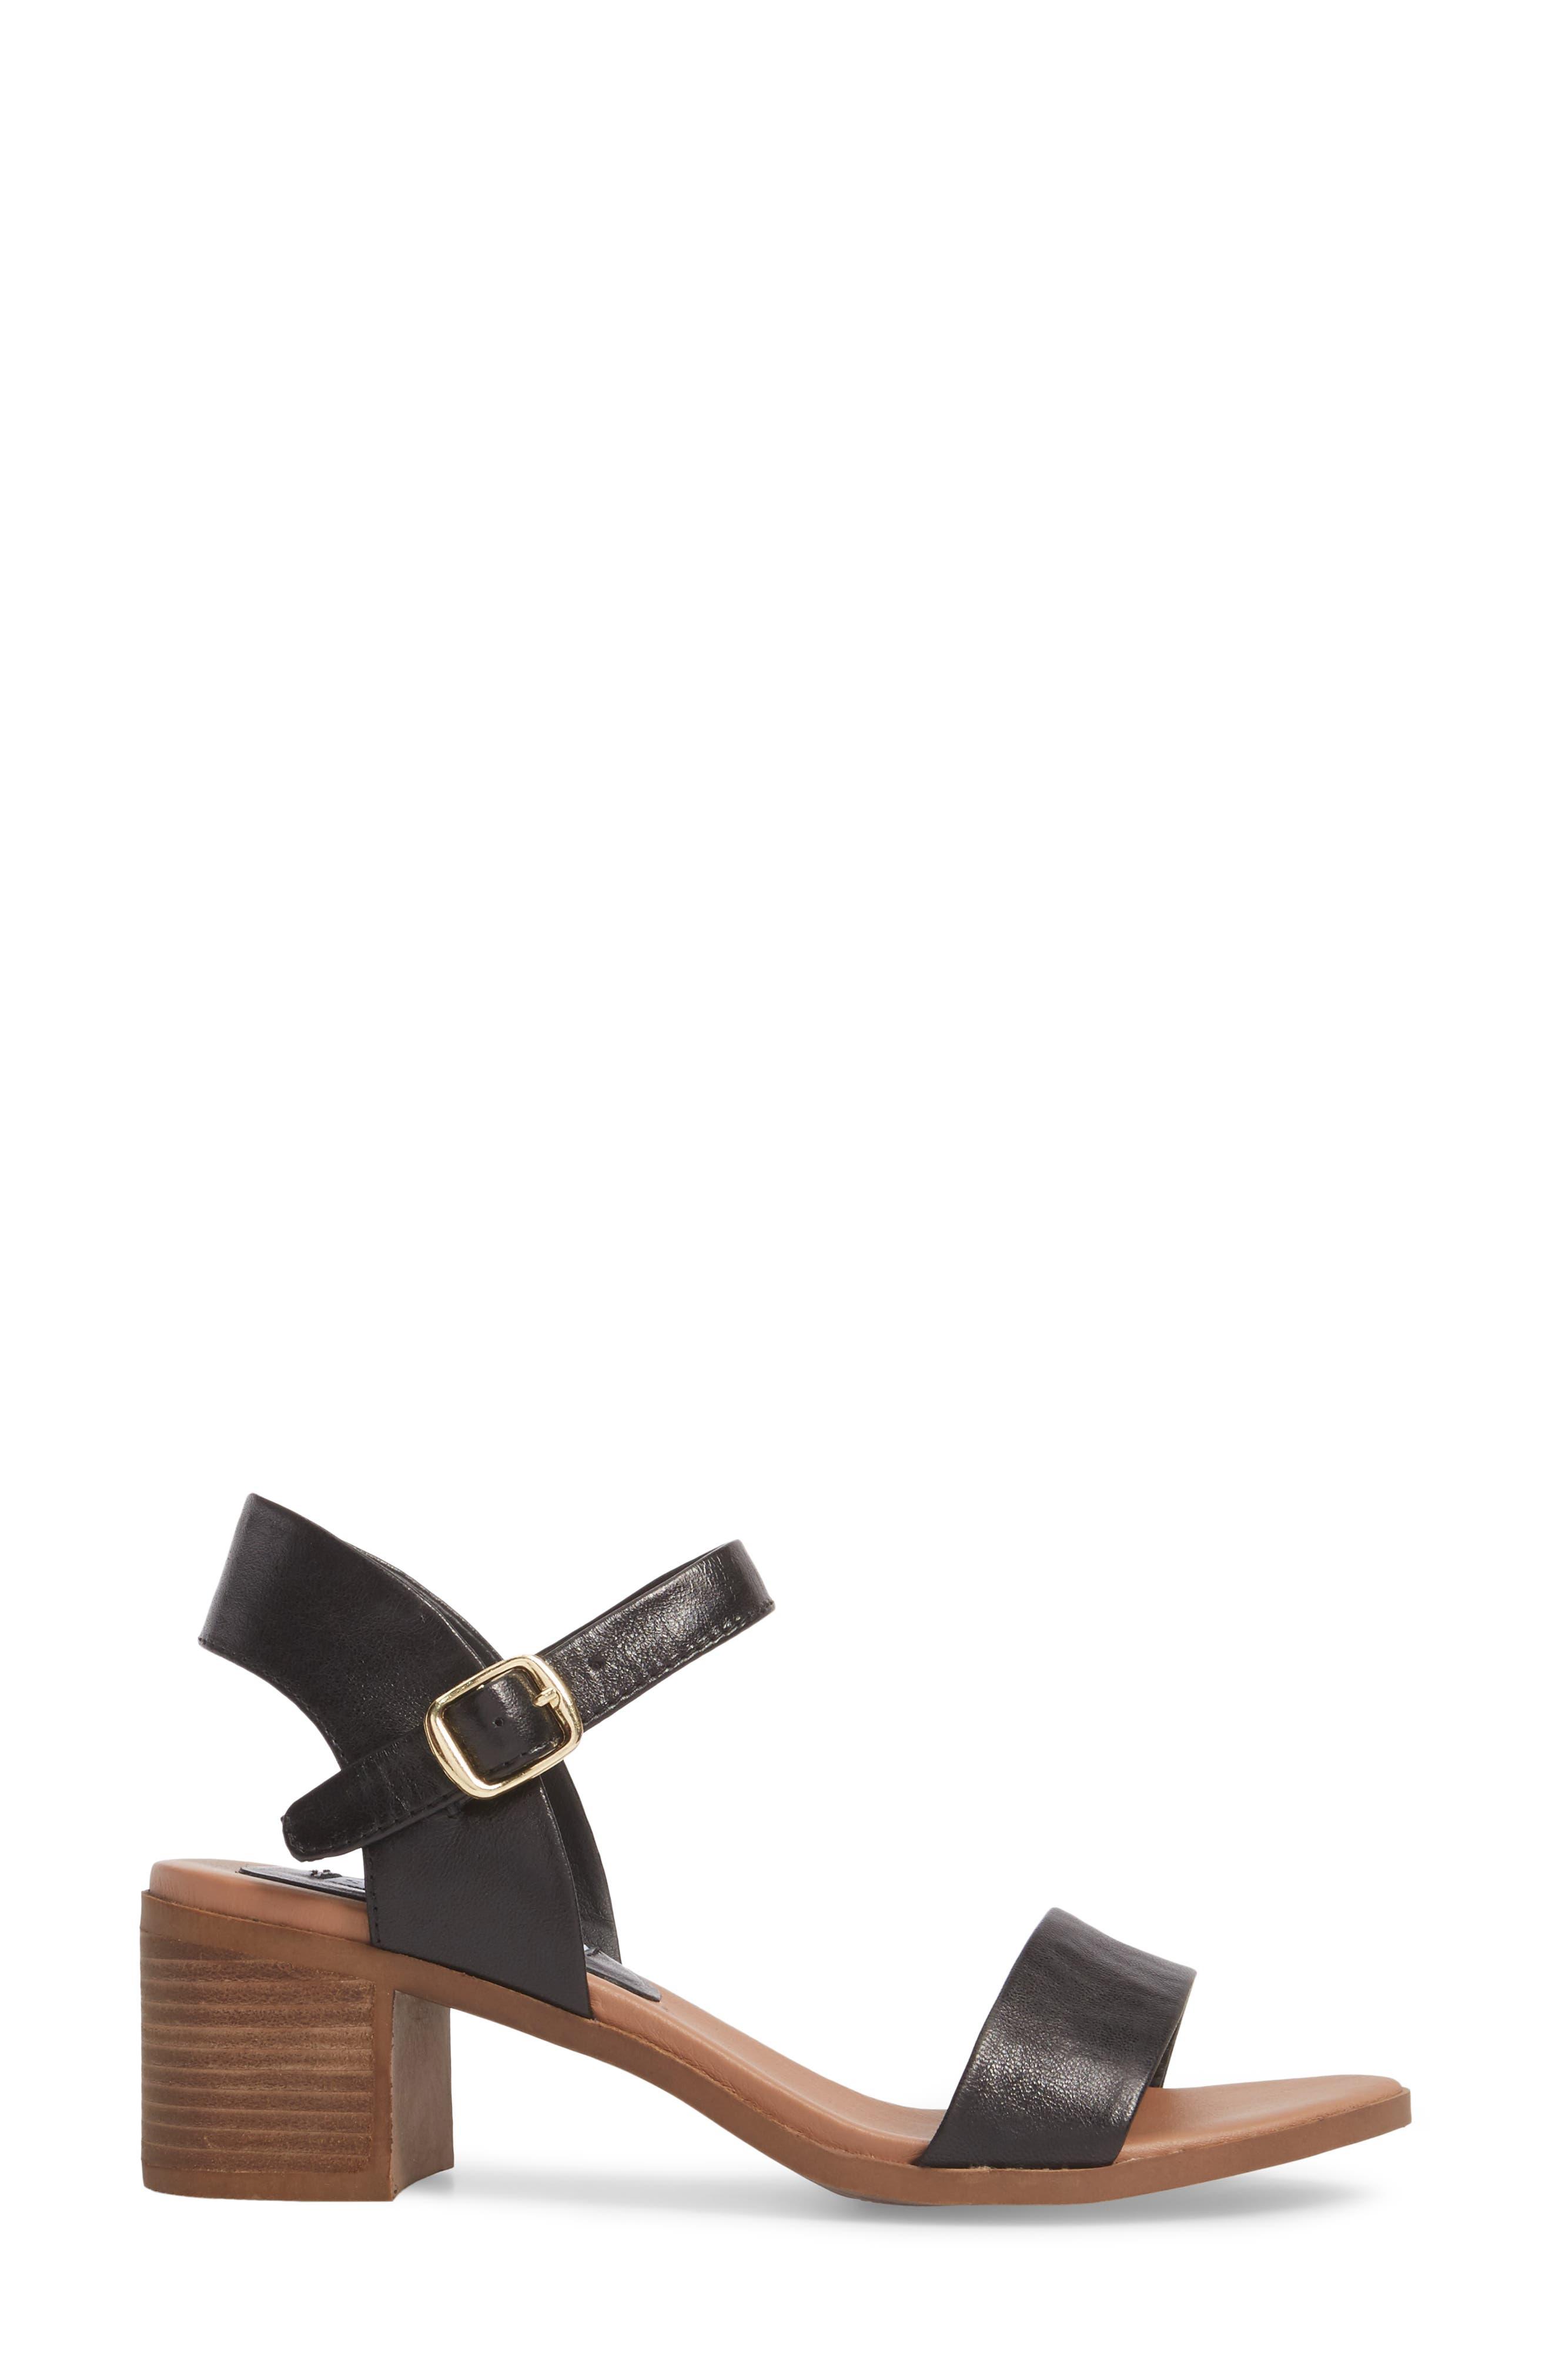 April Block Heel Sandal,                             Alternate thumbnail 3, color,                             BLACK LEATHER